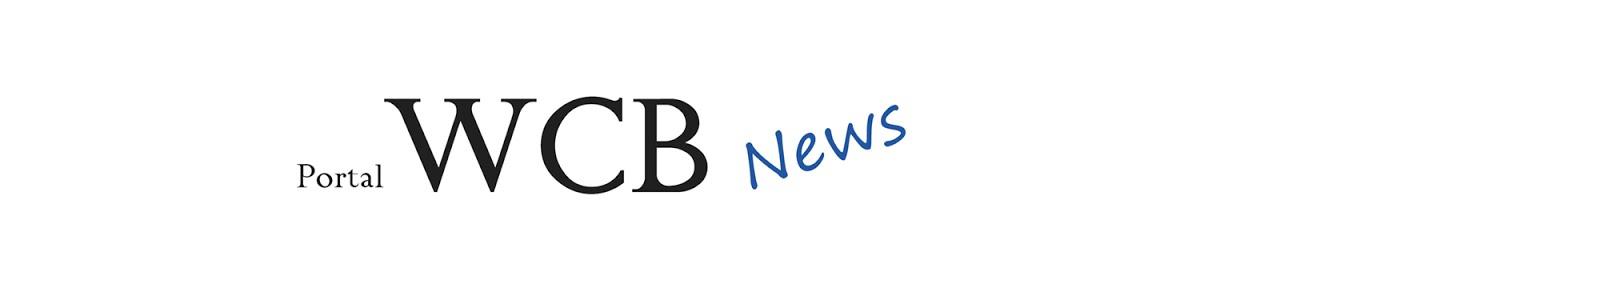 Portal WCB News